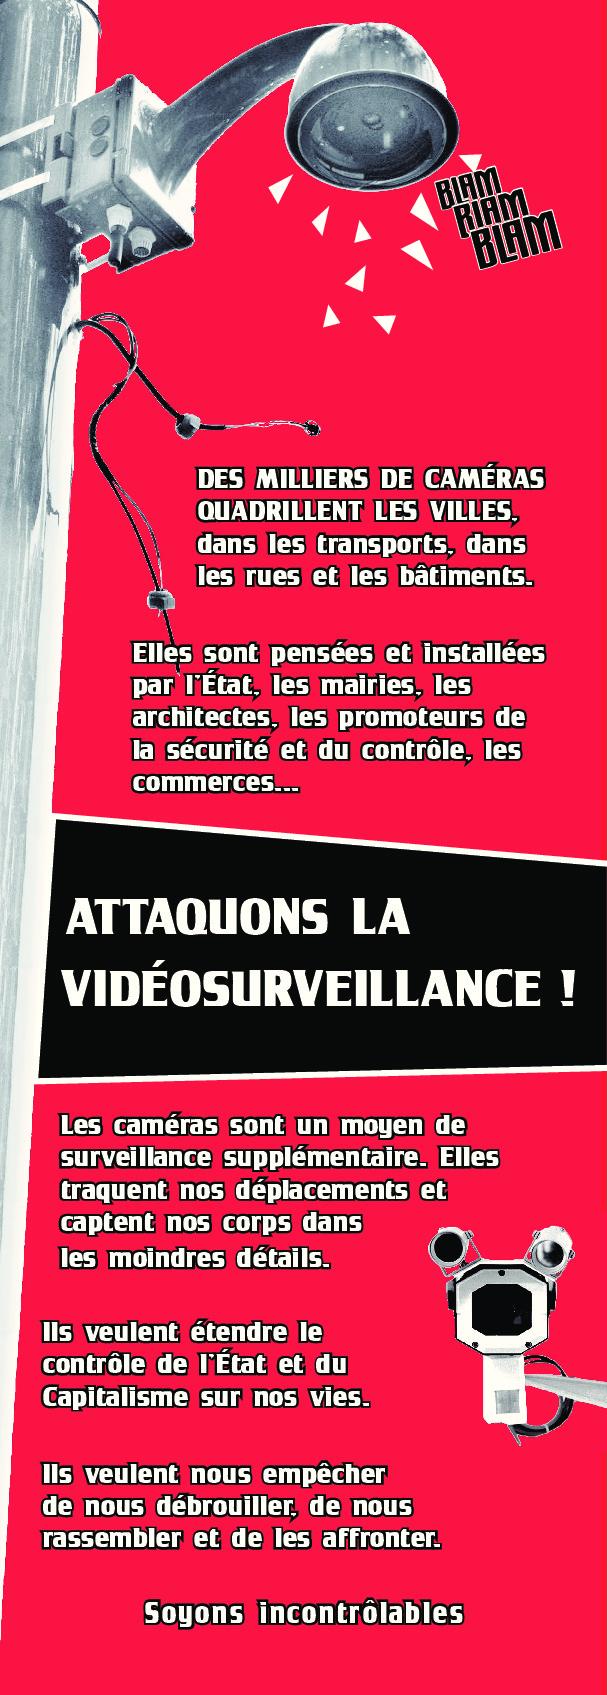 attaquons-la-vidéosurveillance